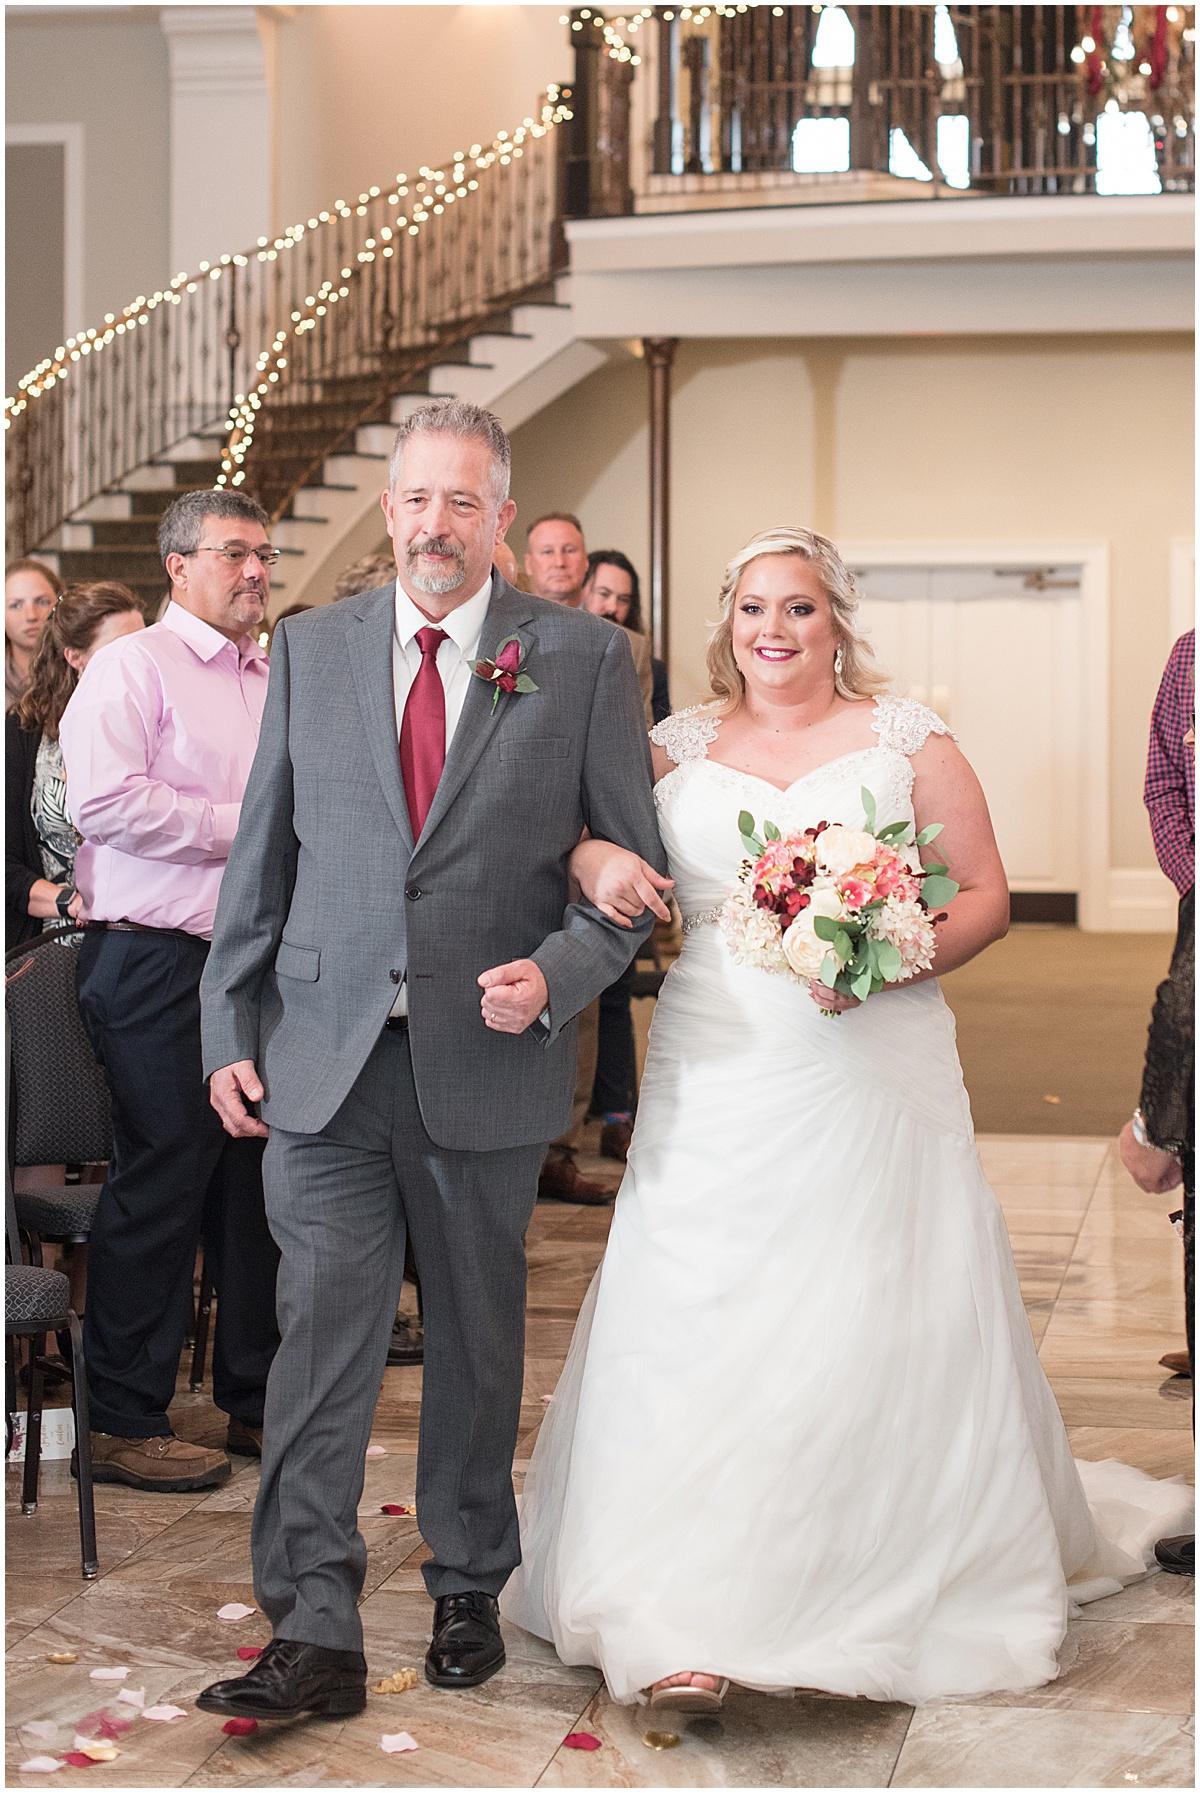 Wedding at Bel Air Events in Kokomo, Indiana